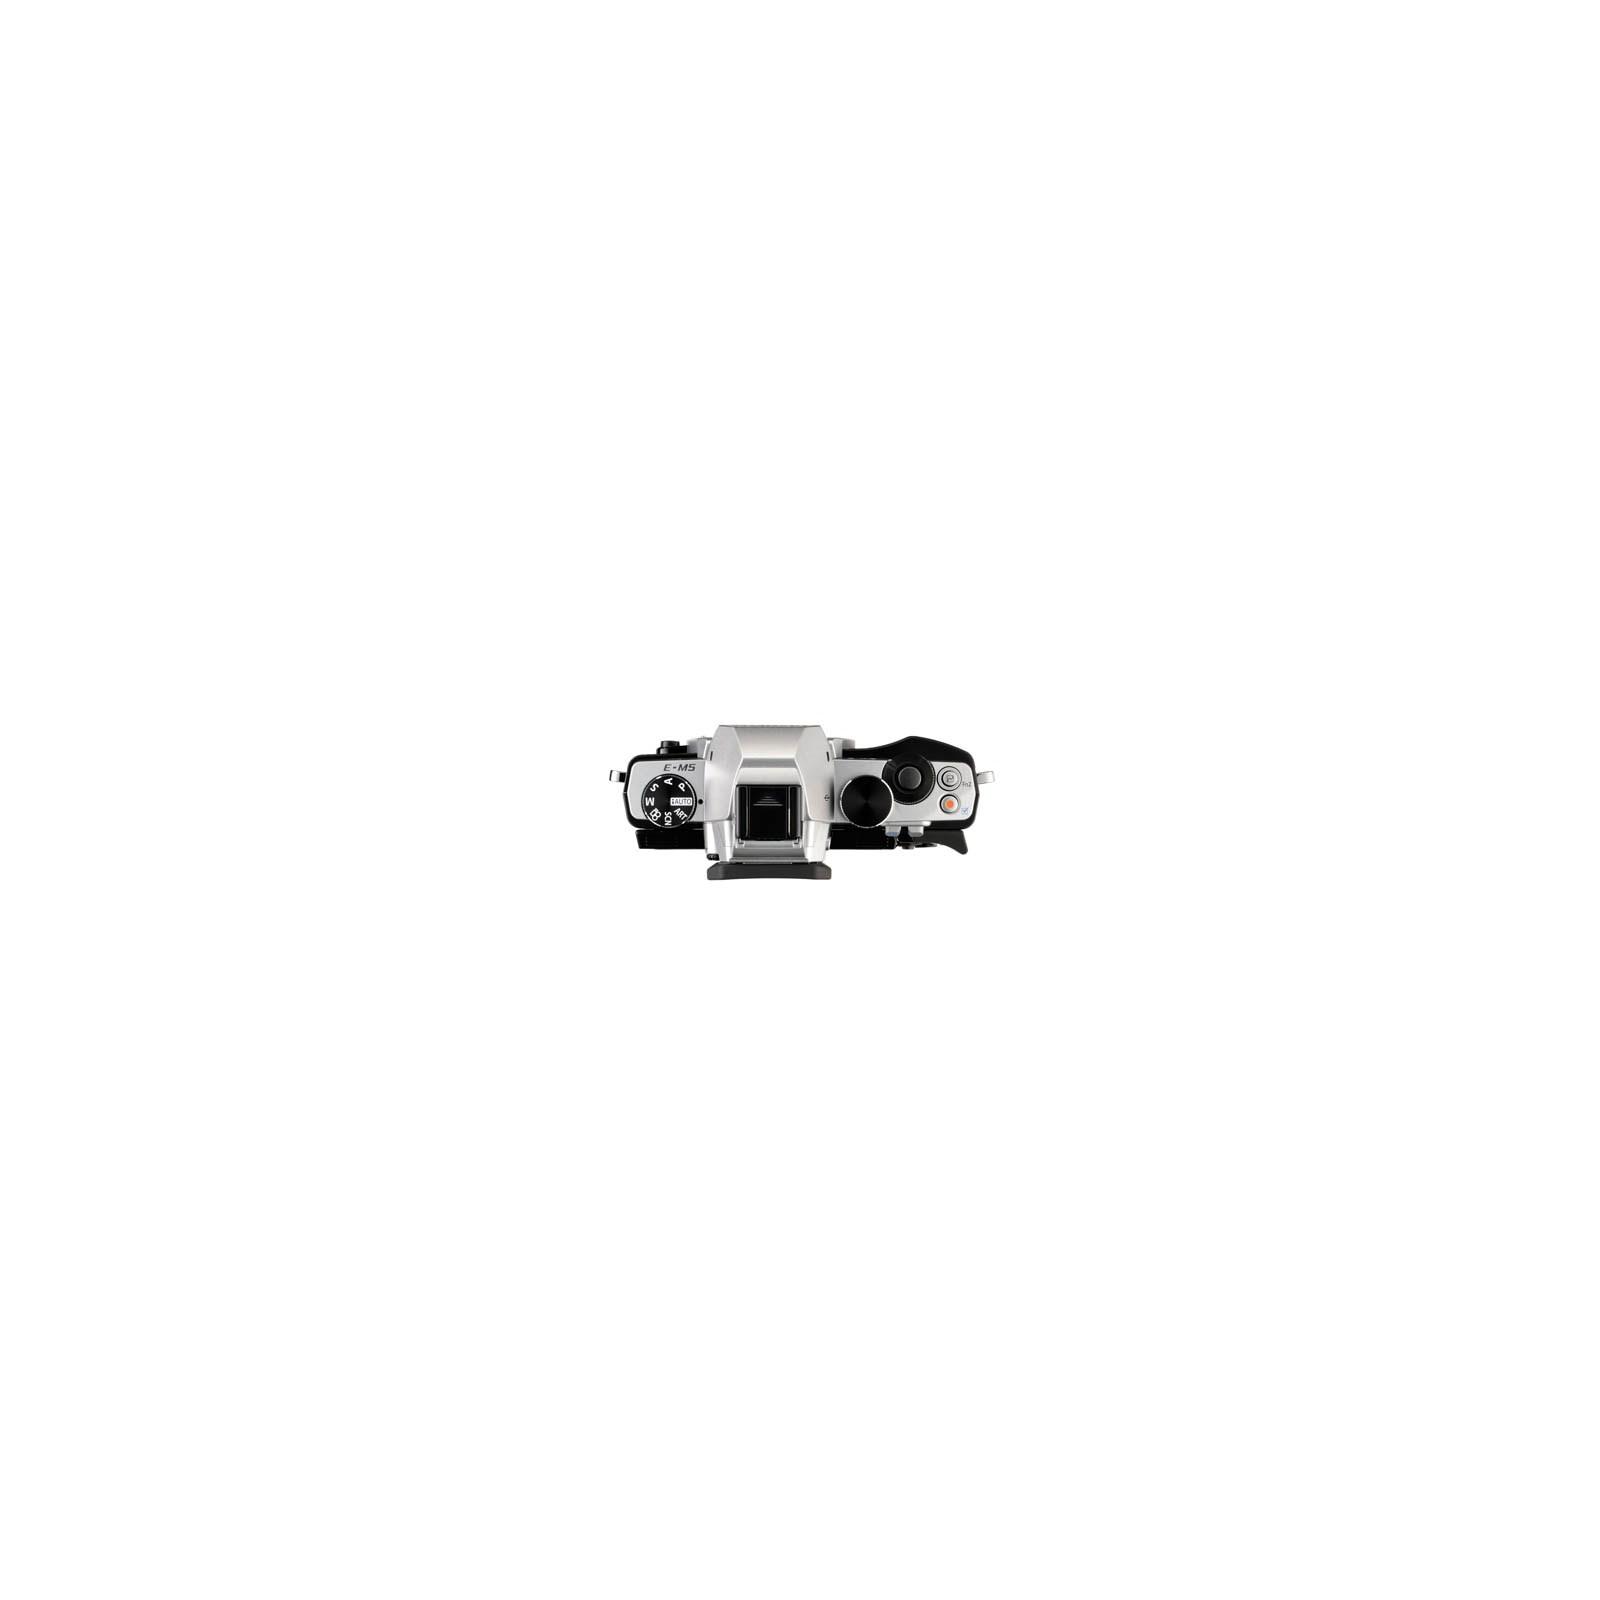 Цифровой фотоаппарат OLYMPUS OM-D E-M5 body silver (V204040SE000) изображение 3